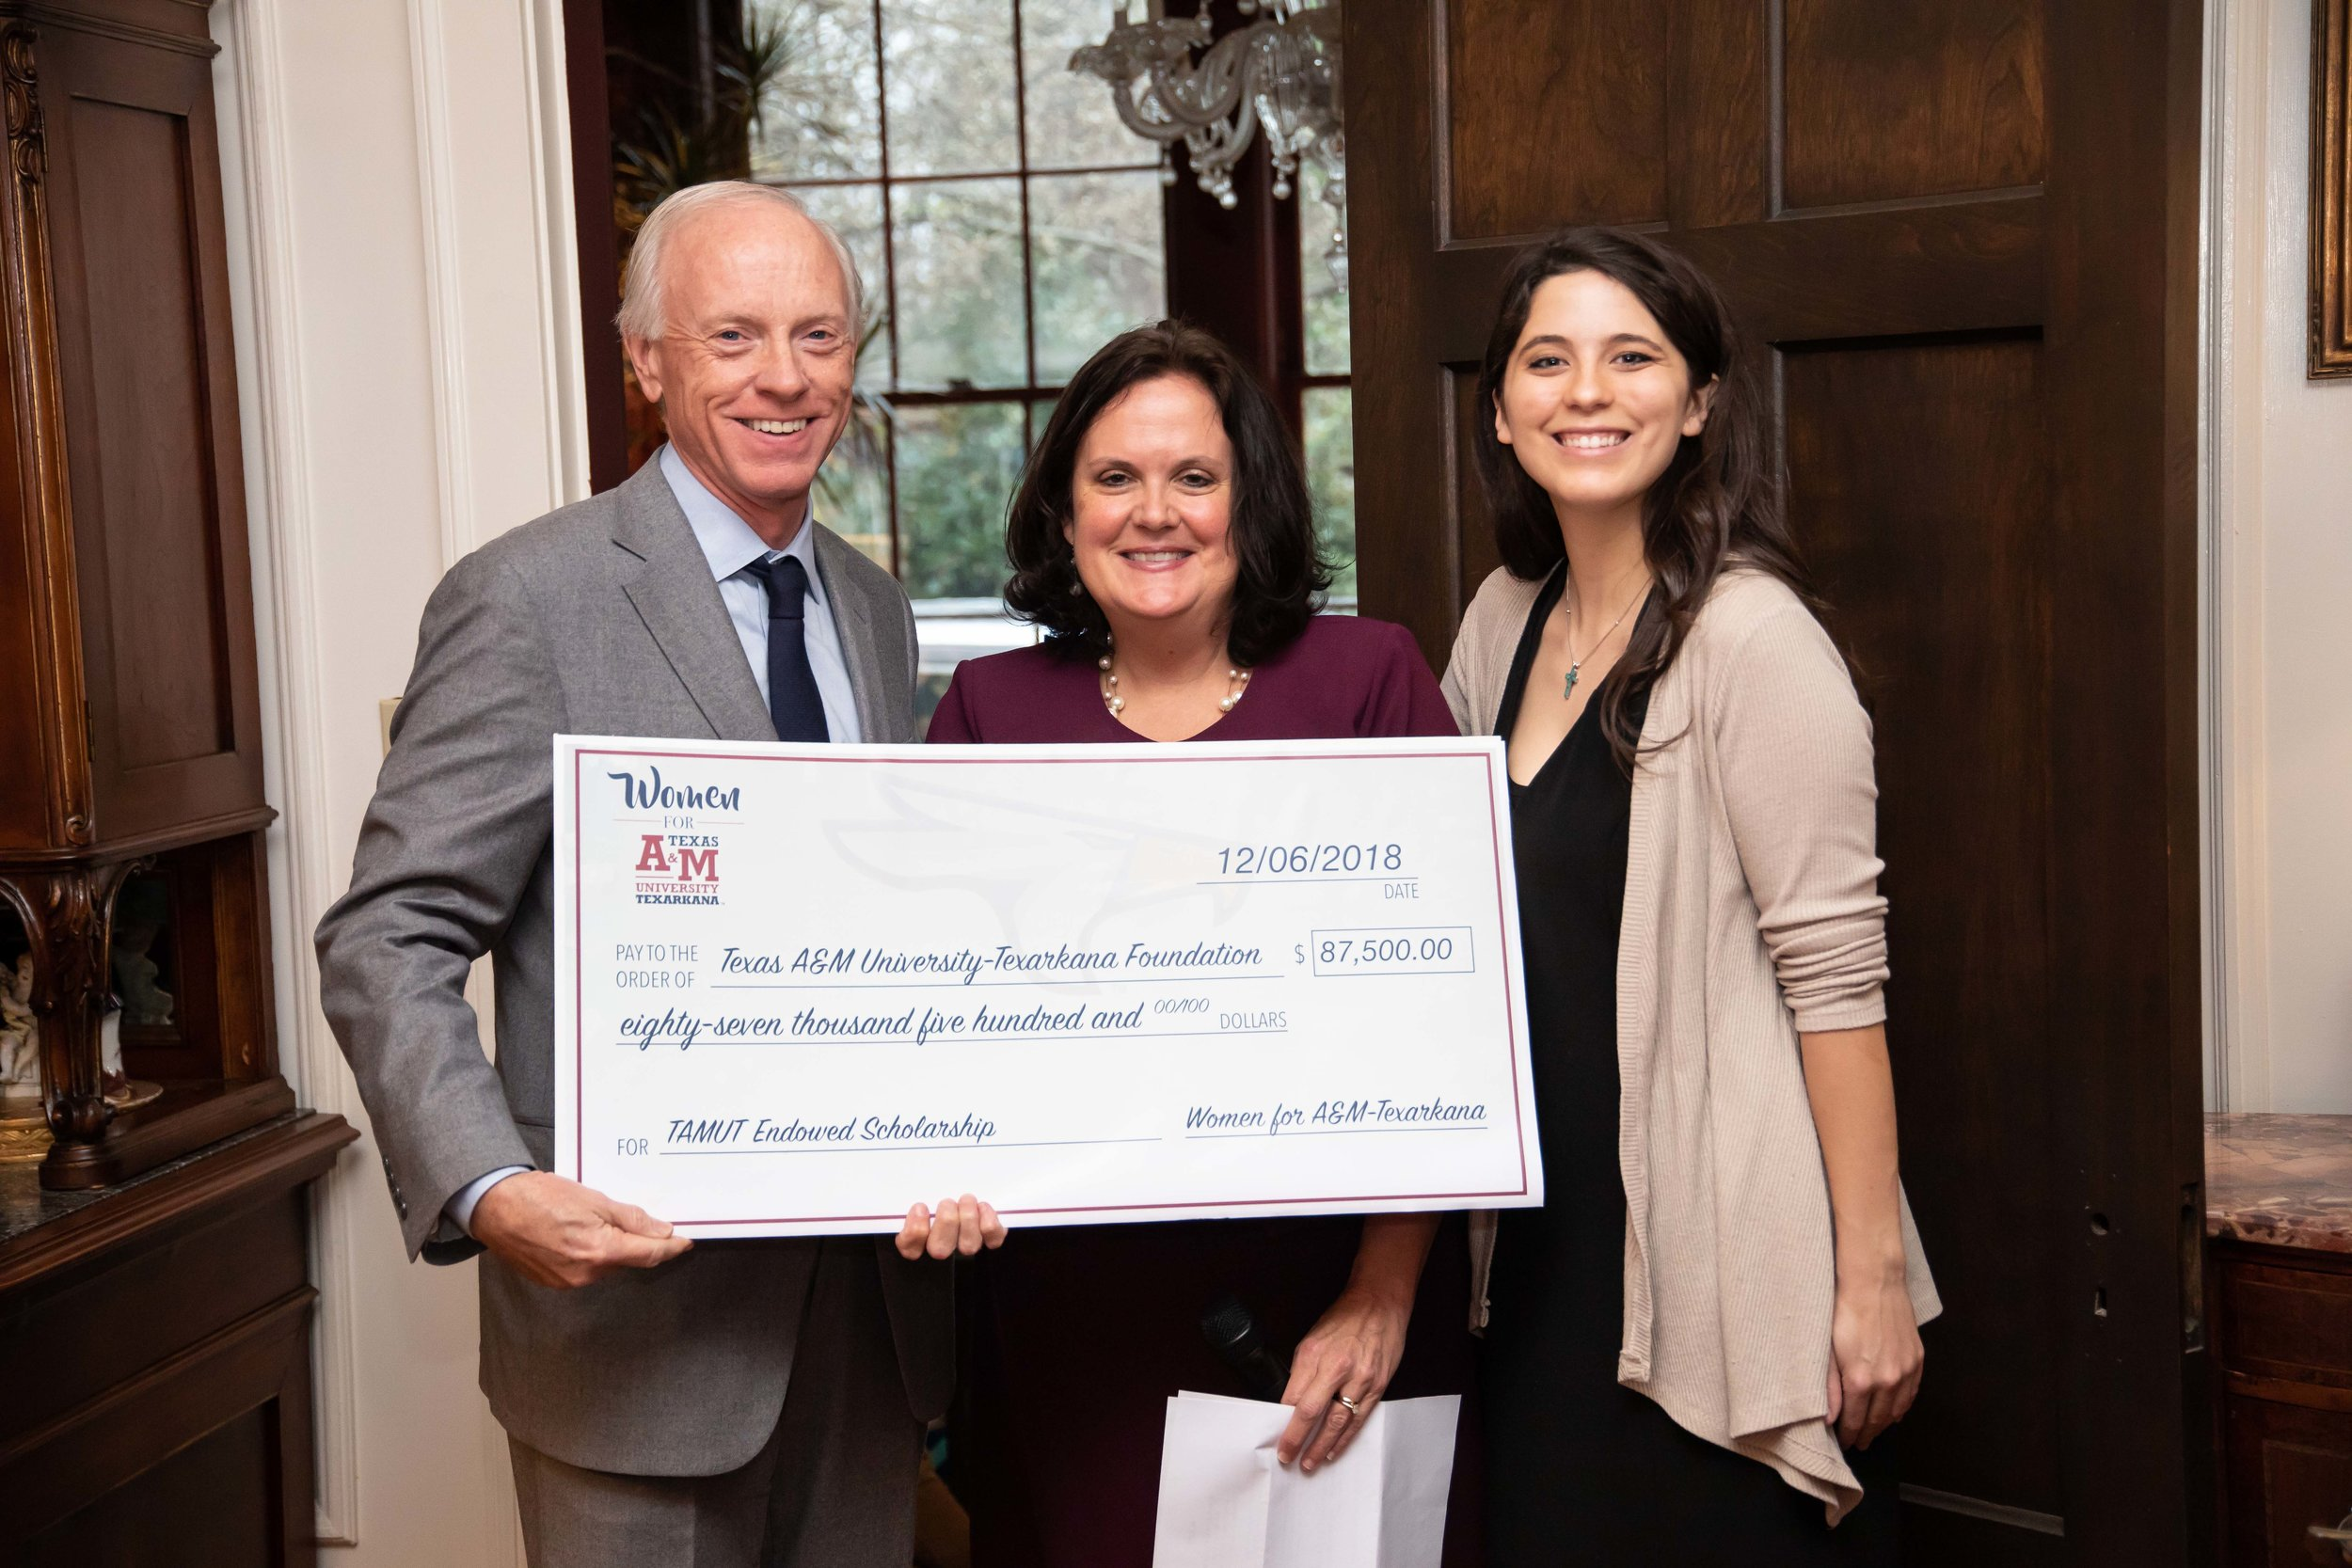 Scott Bruner, TAMUT Foundation Board; Virginia Trammell, Women for A&M-Texarkana; and Courtney Lebrun, student and scholarship recipient